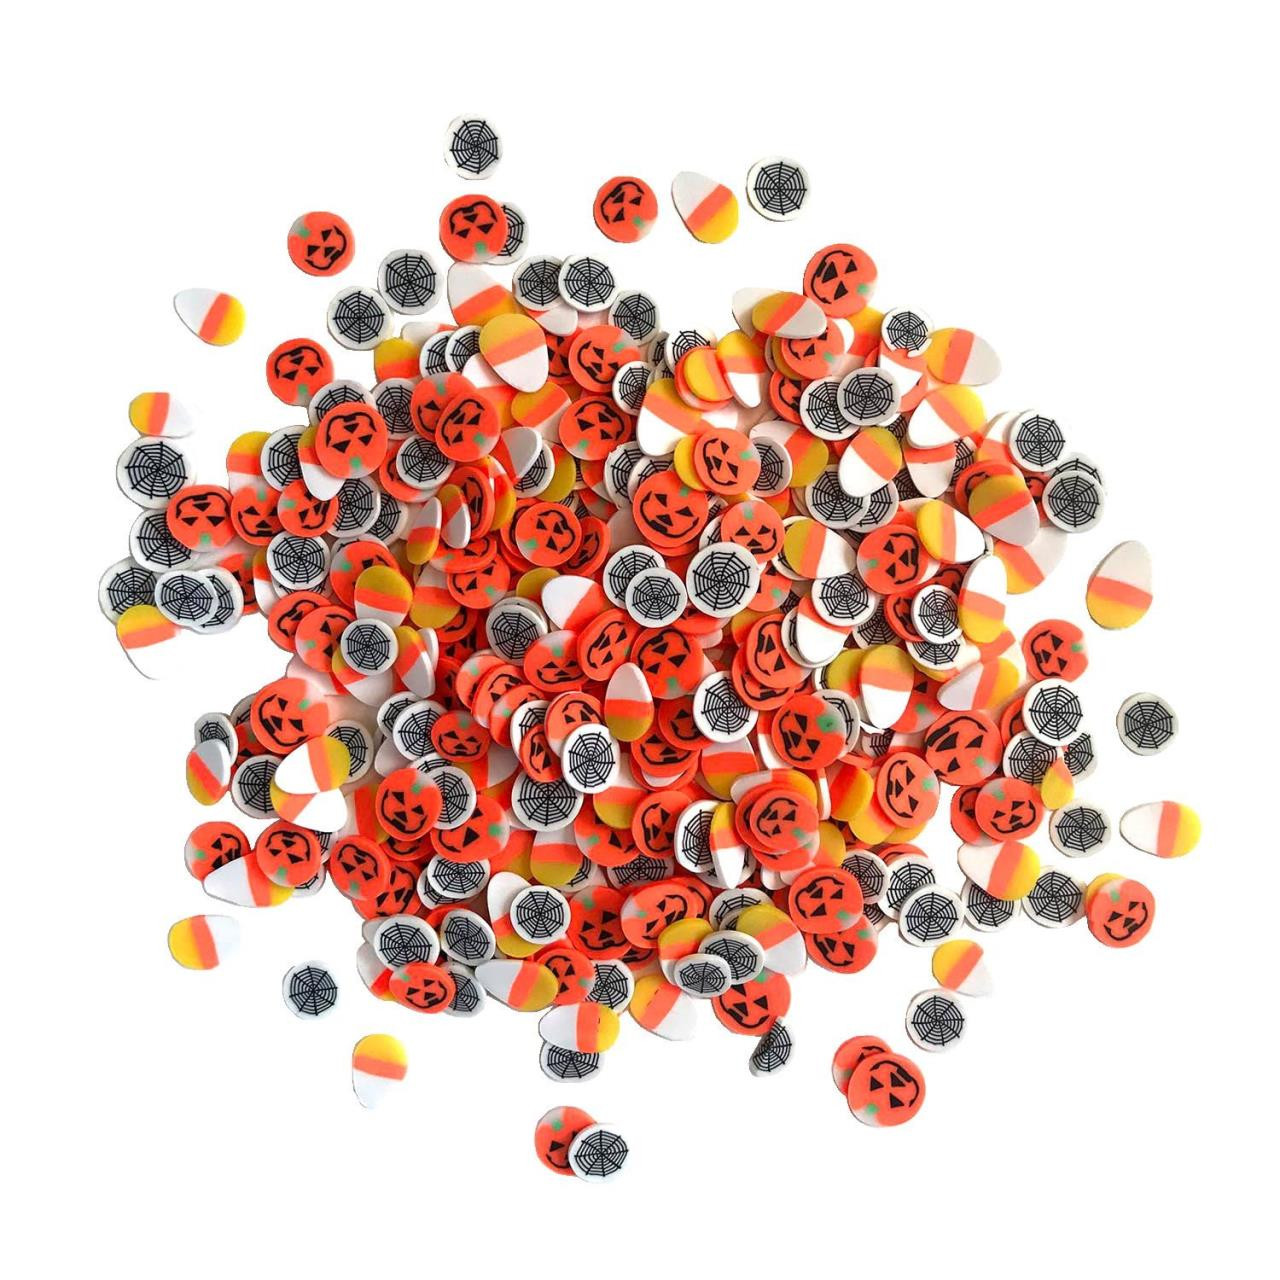 October 31st, Buttons Galore Sprinkletz -